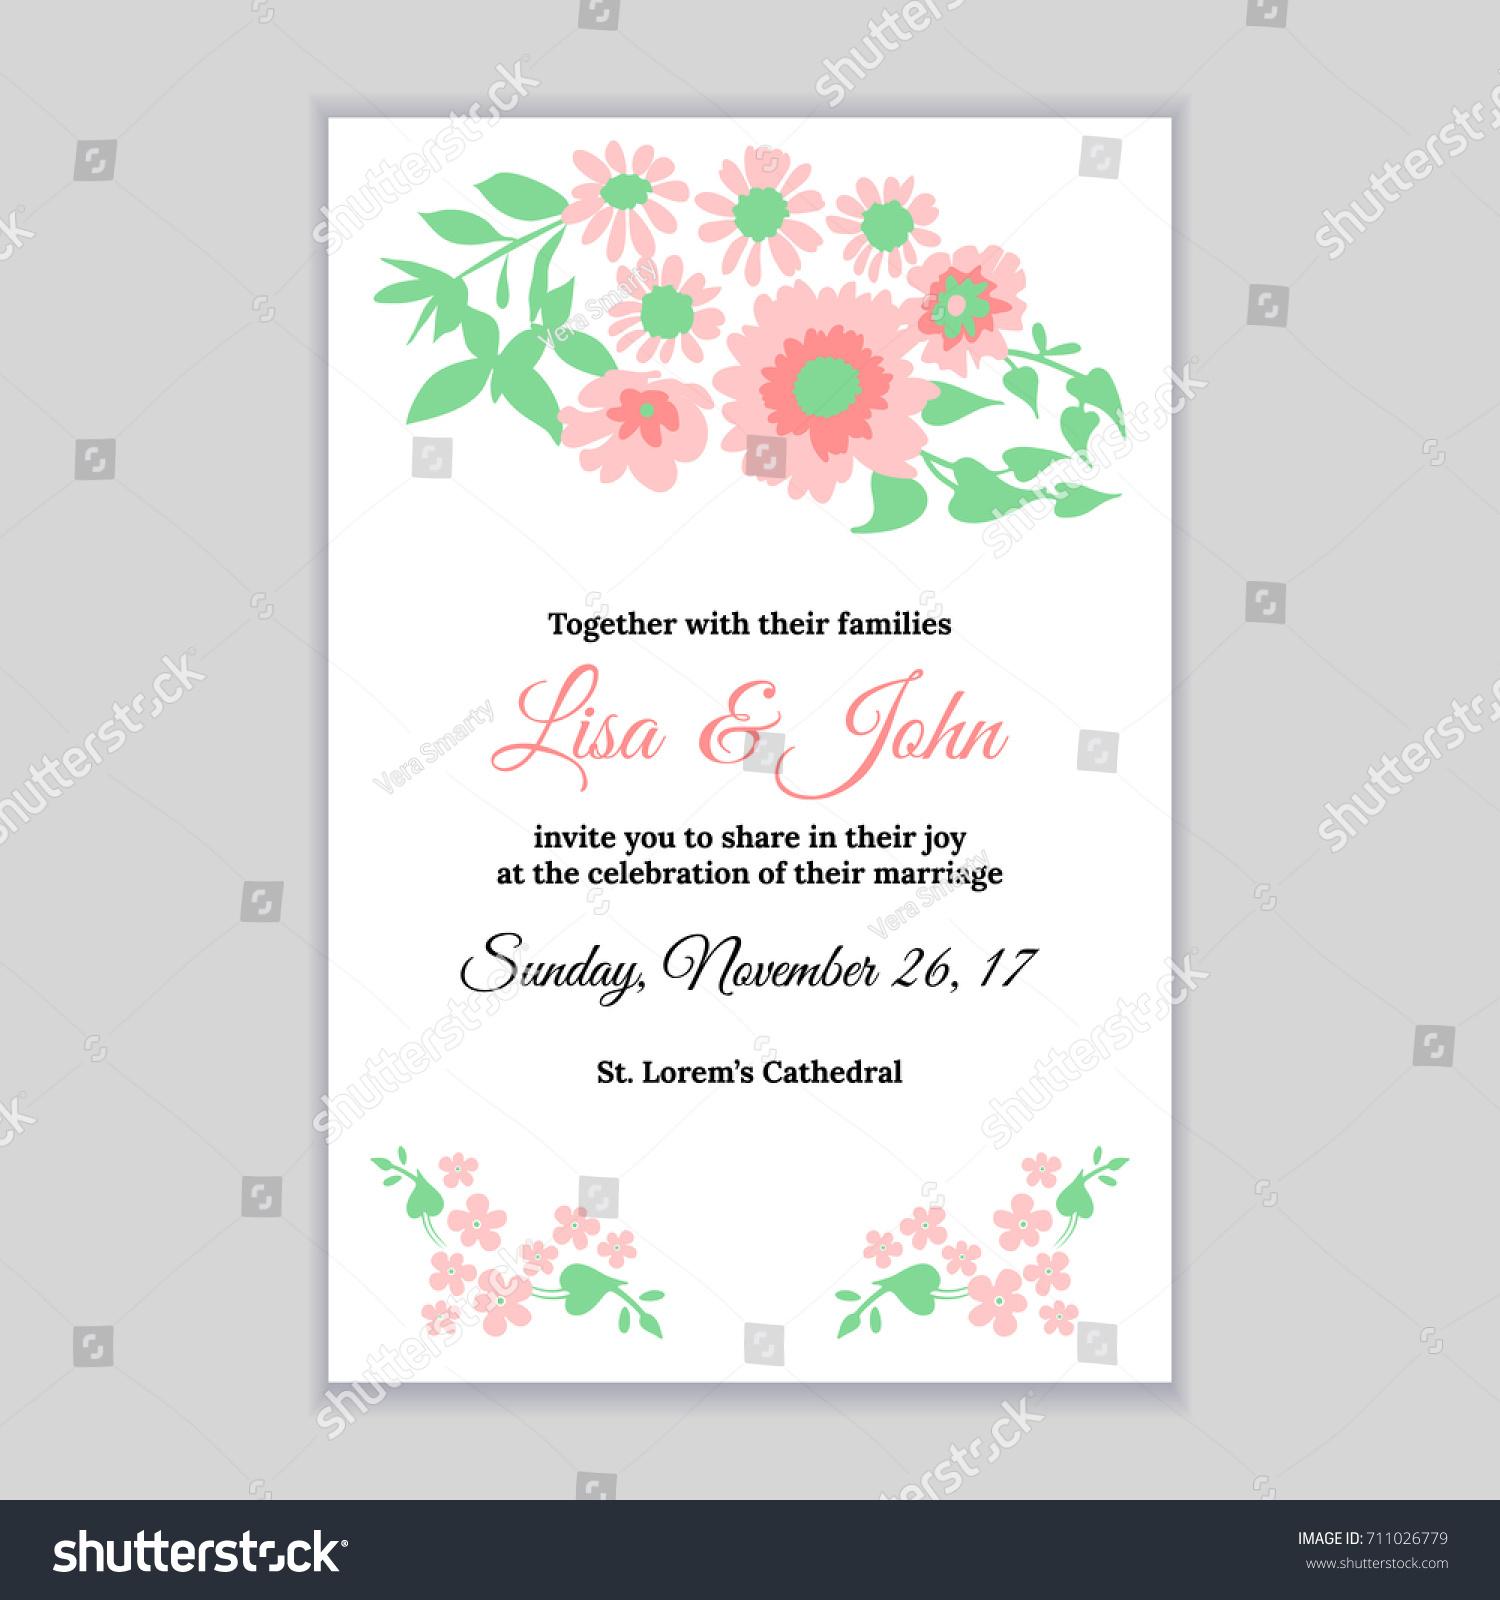 wedding invitation pink daisy flowers bridal stock vector royalty